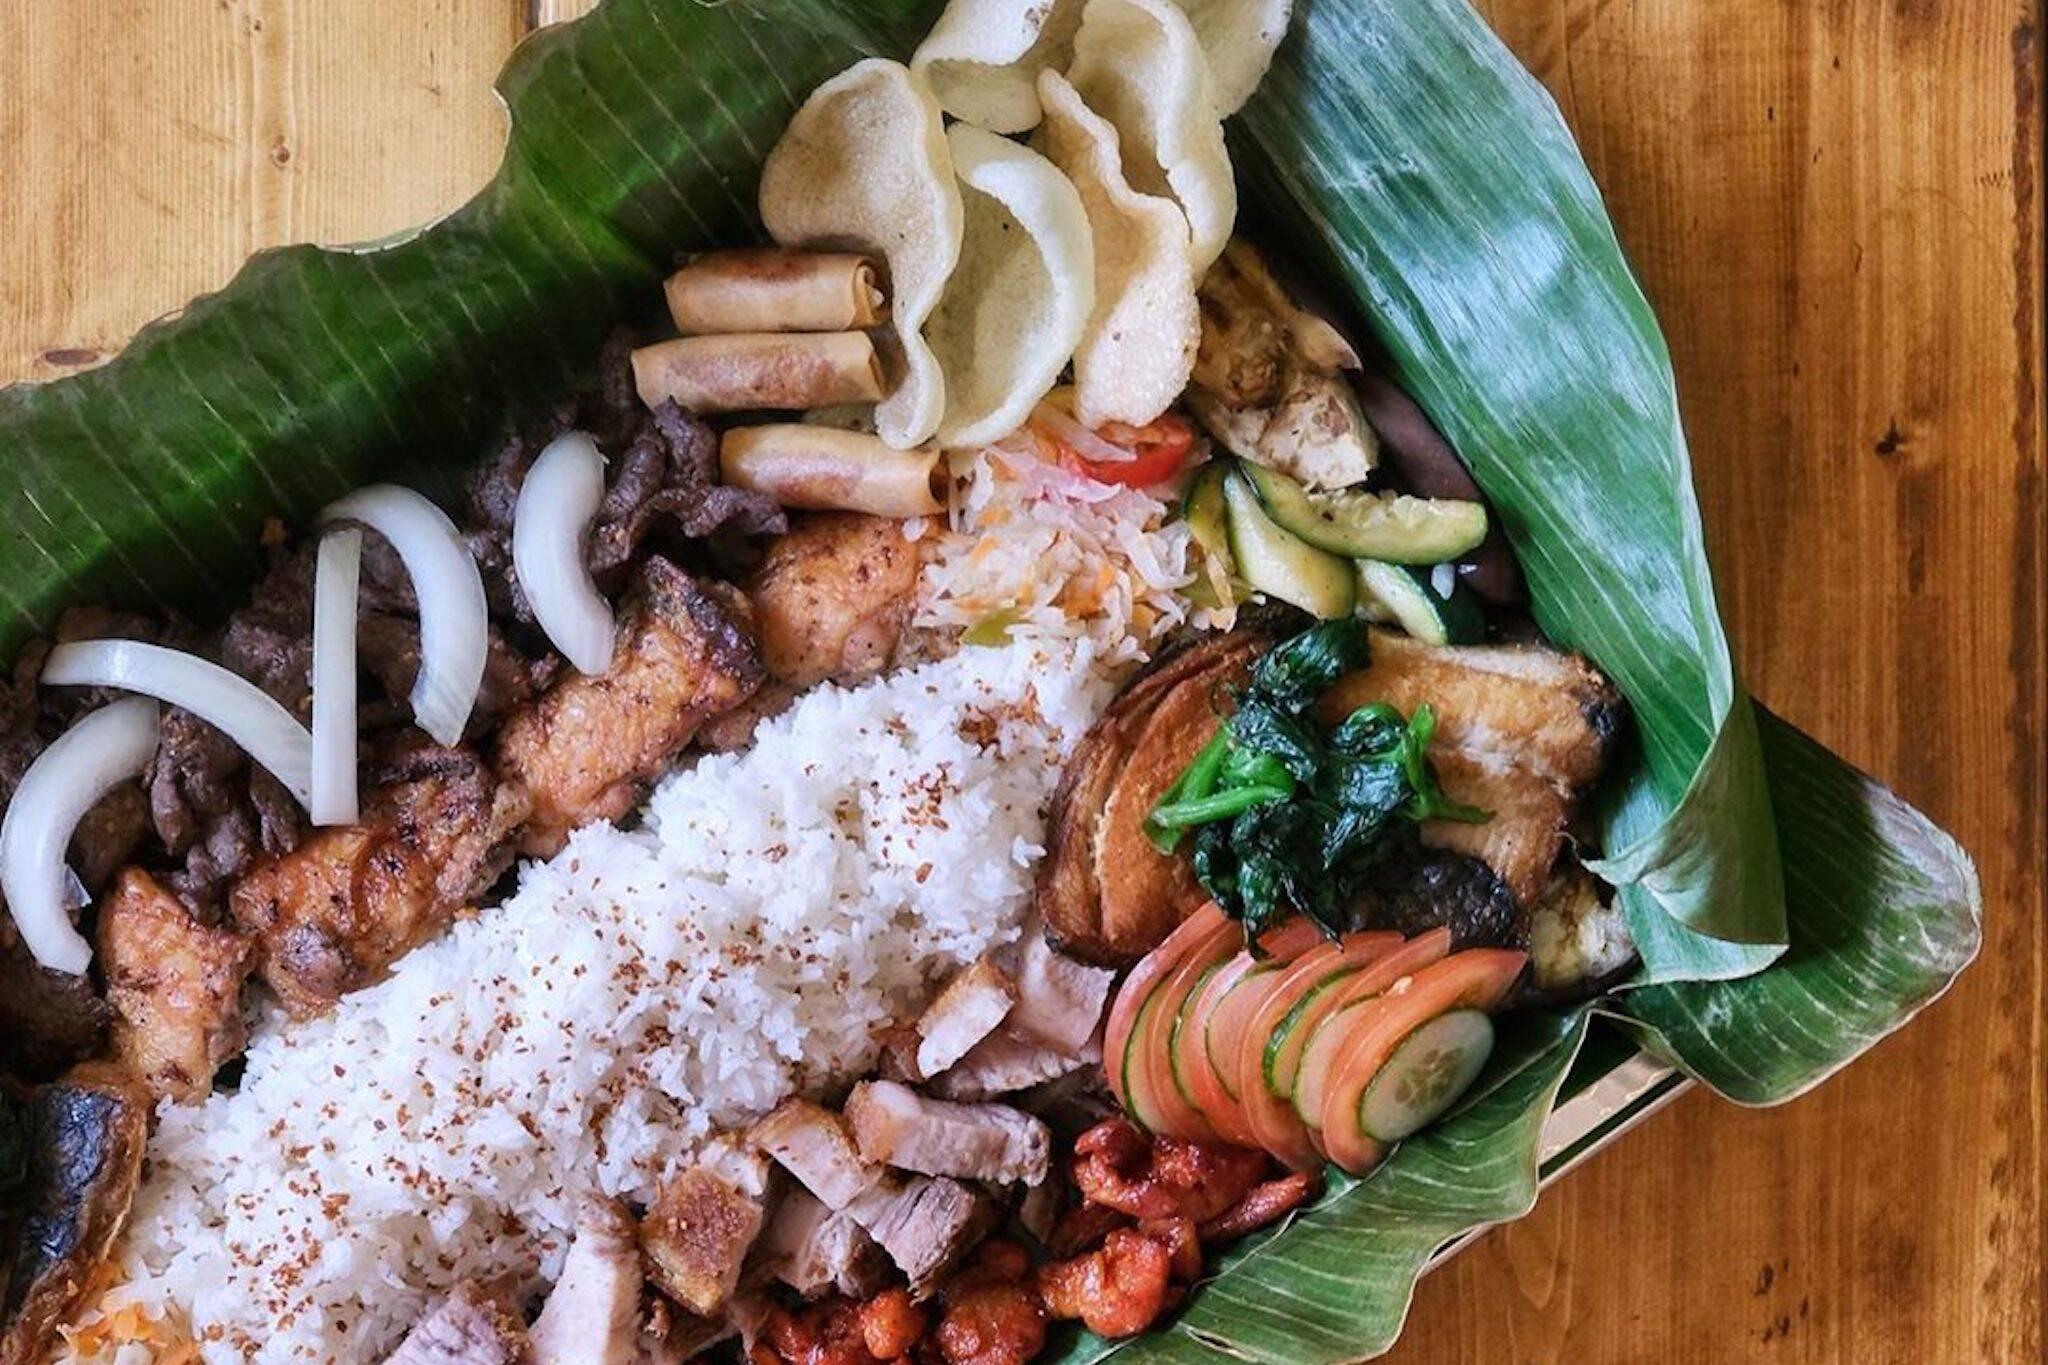 kamayan delivery toronto